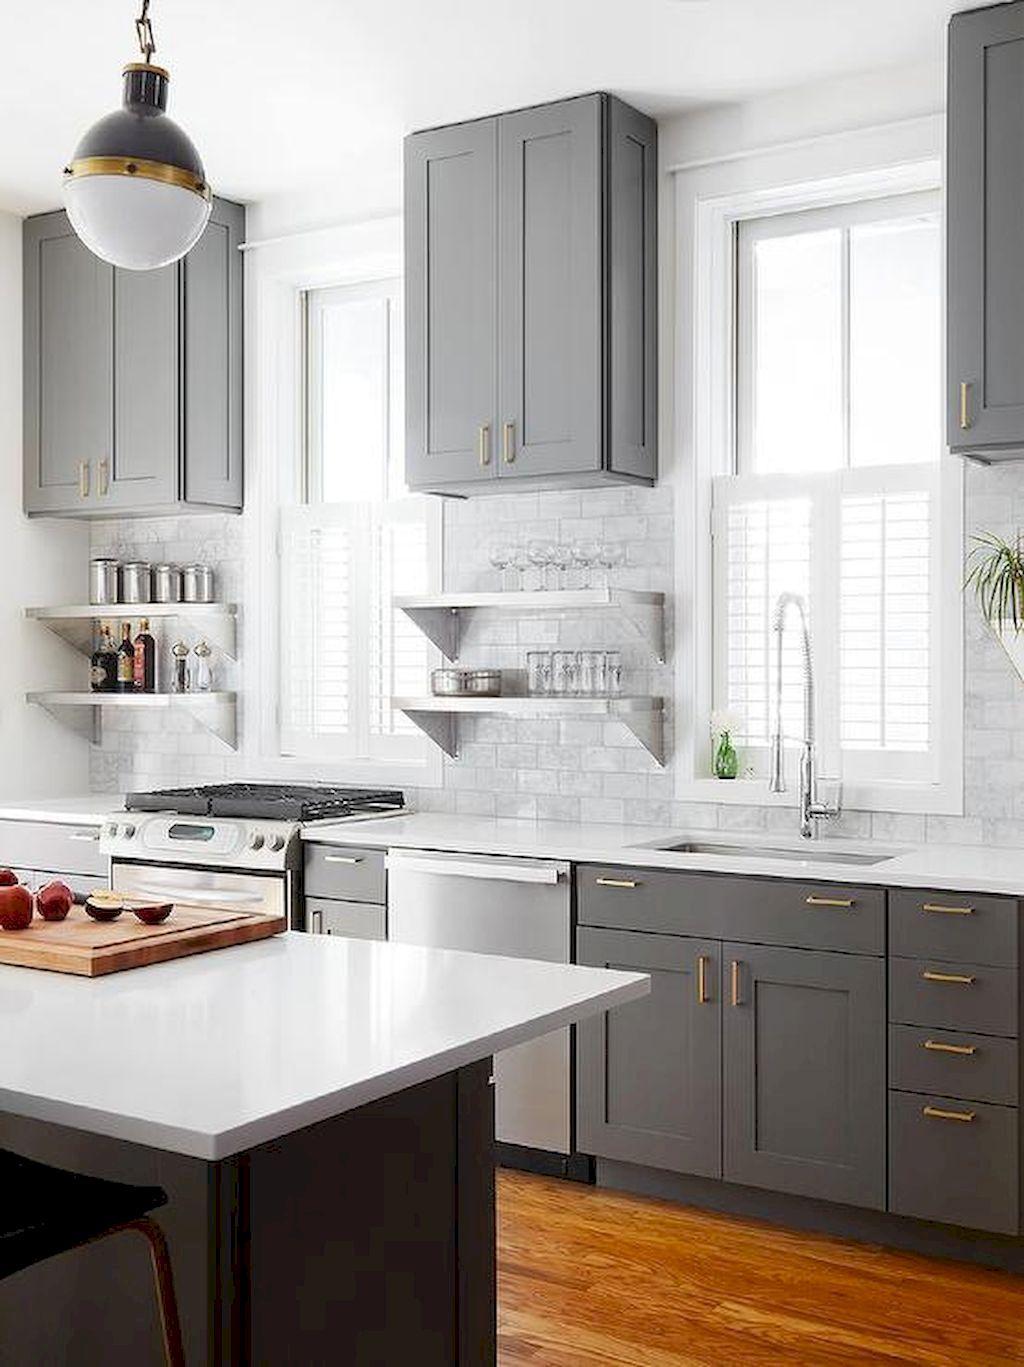 Cool 85 Rustic Farmhouse Kitchen Makeover Ideas